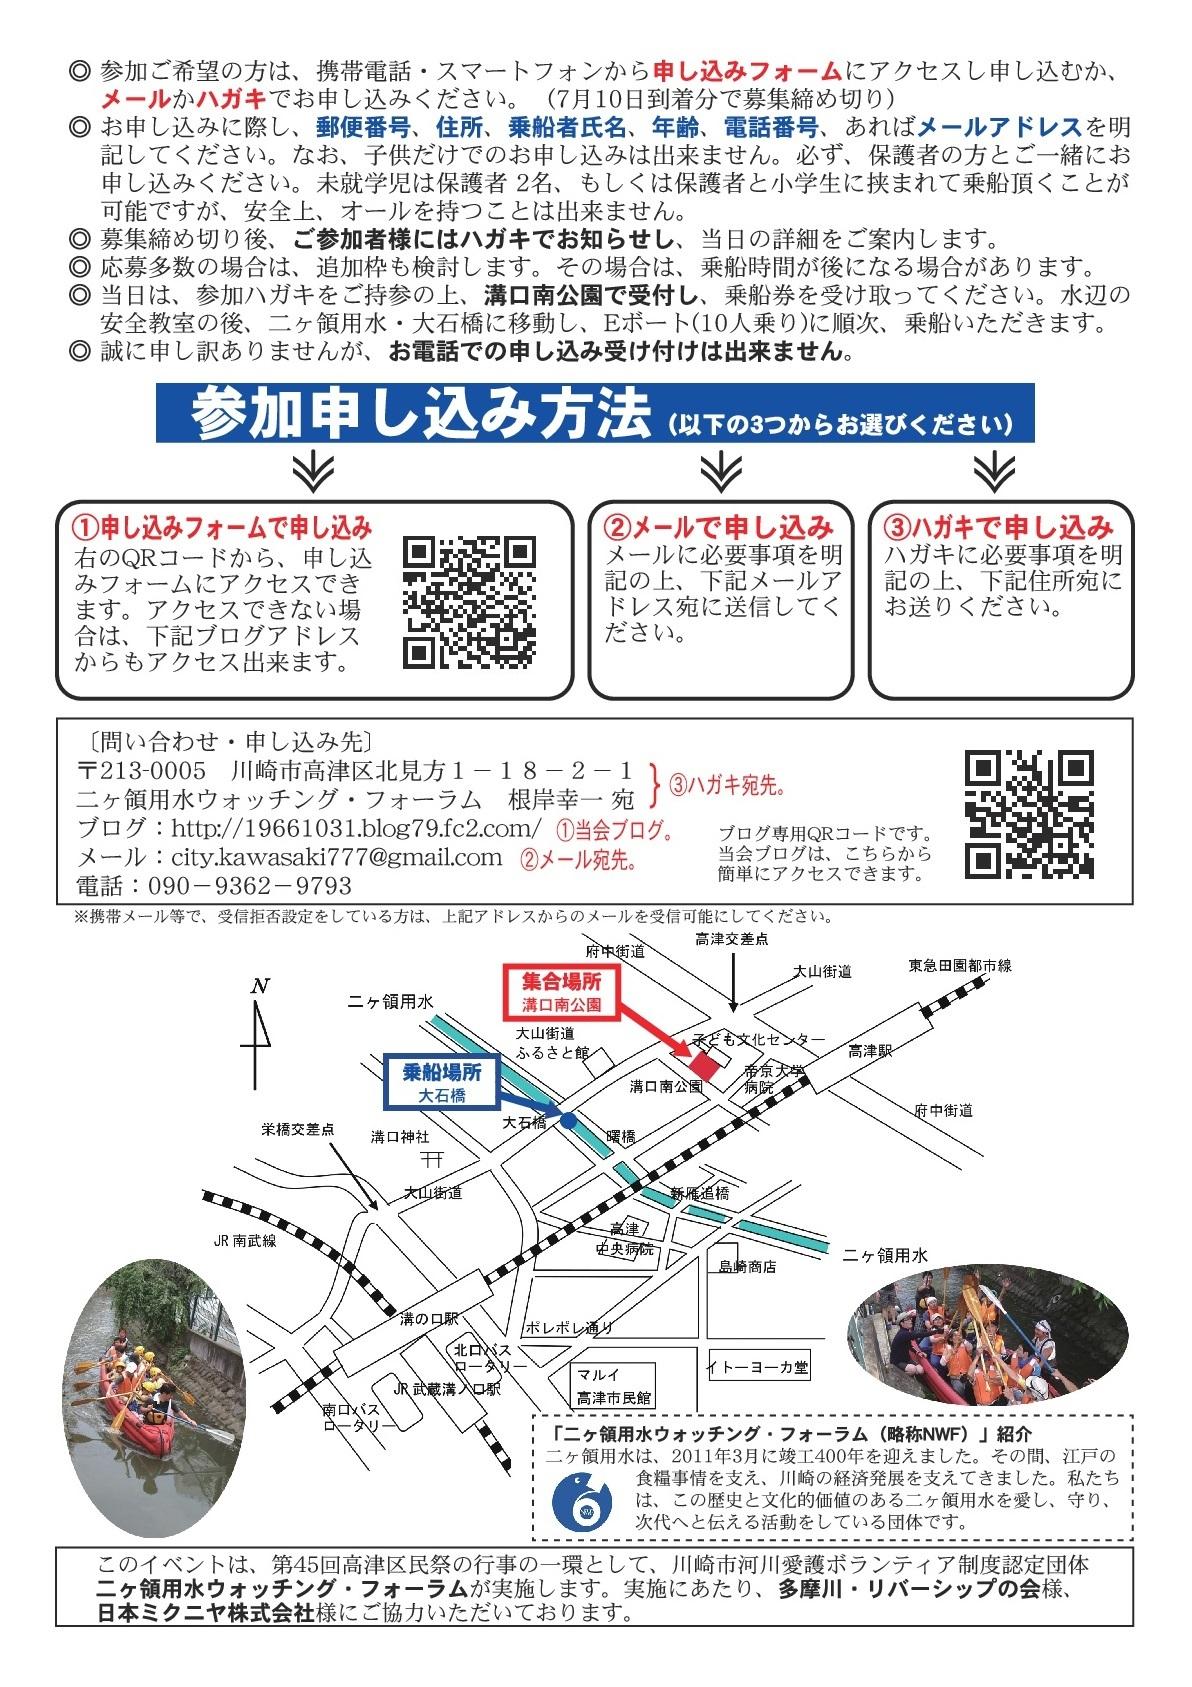 A4たて(裏)_アウトライン_45高津区民祭_20180729